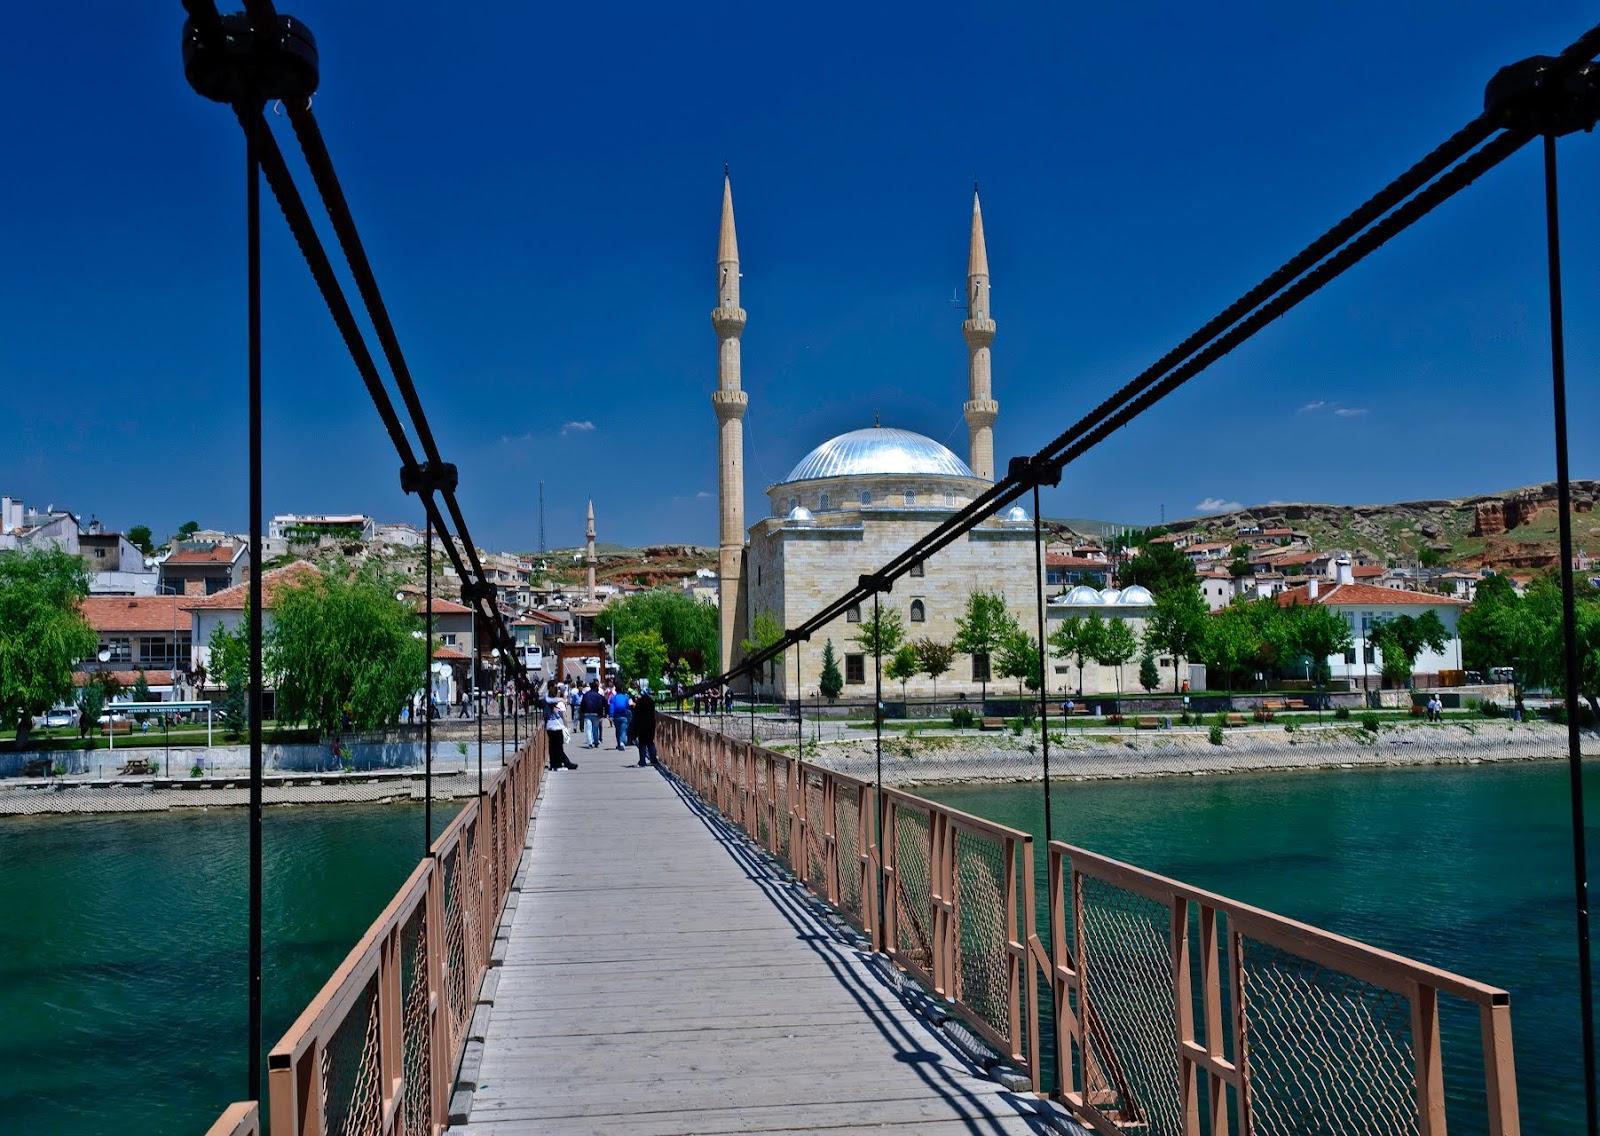 Travel My Way: Turkey - Göreme Province